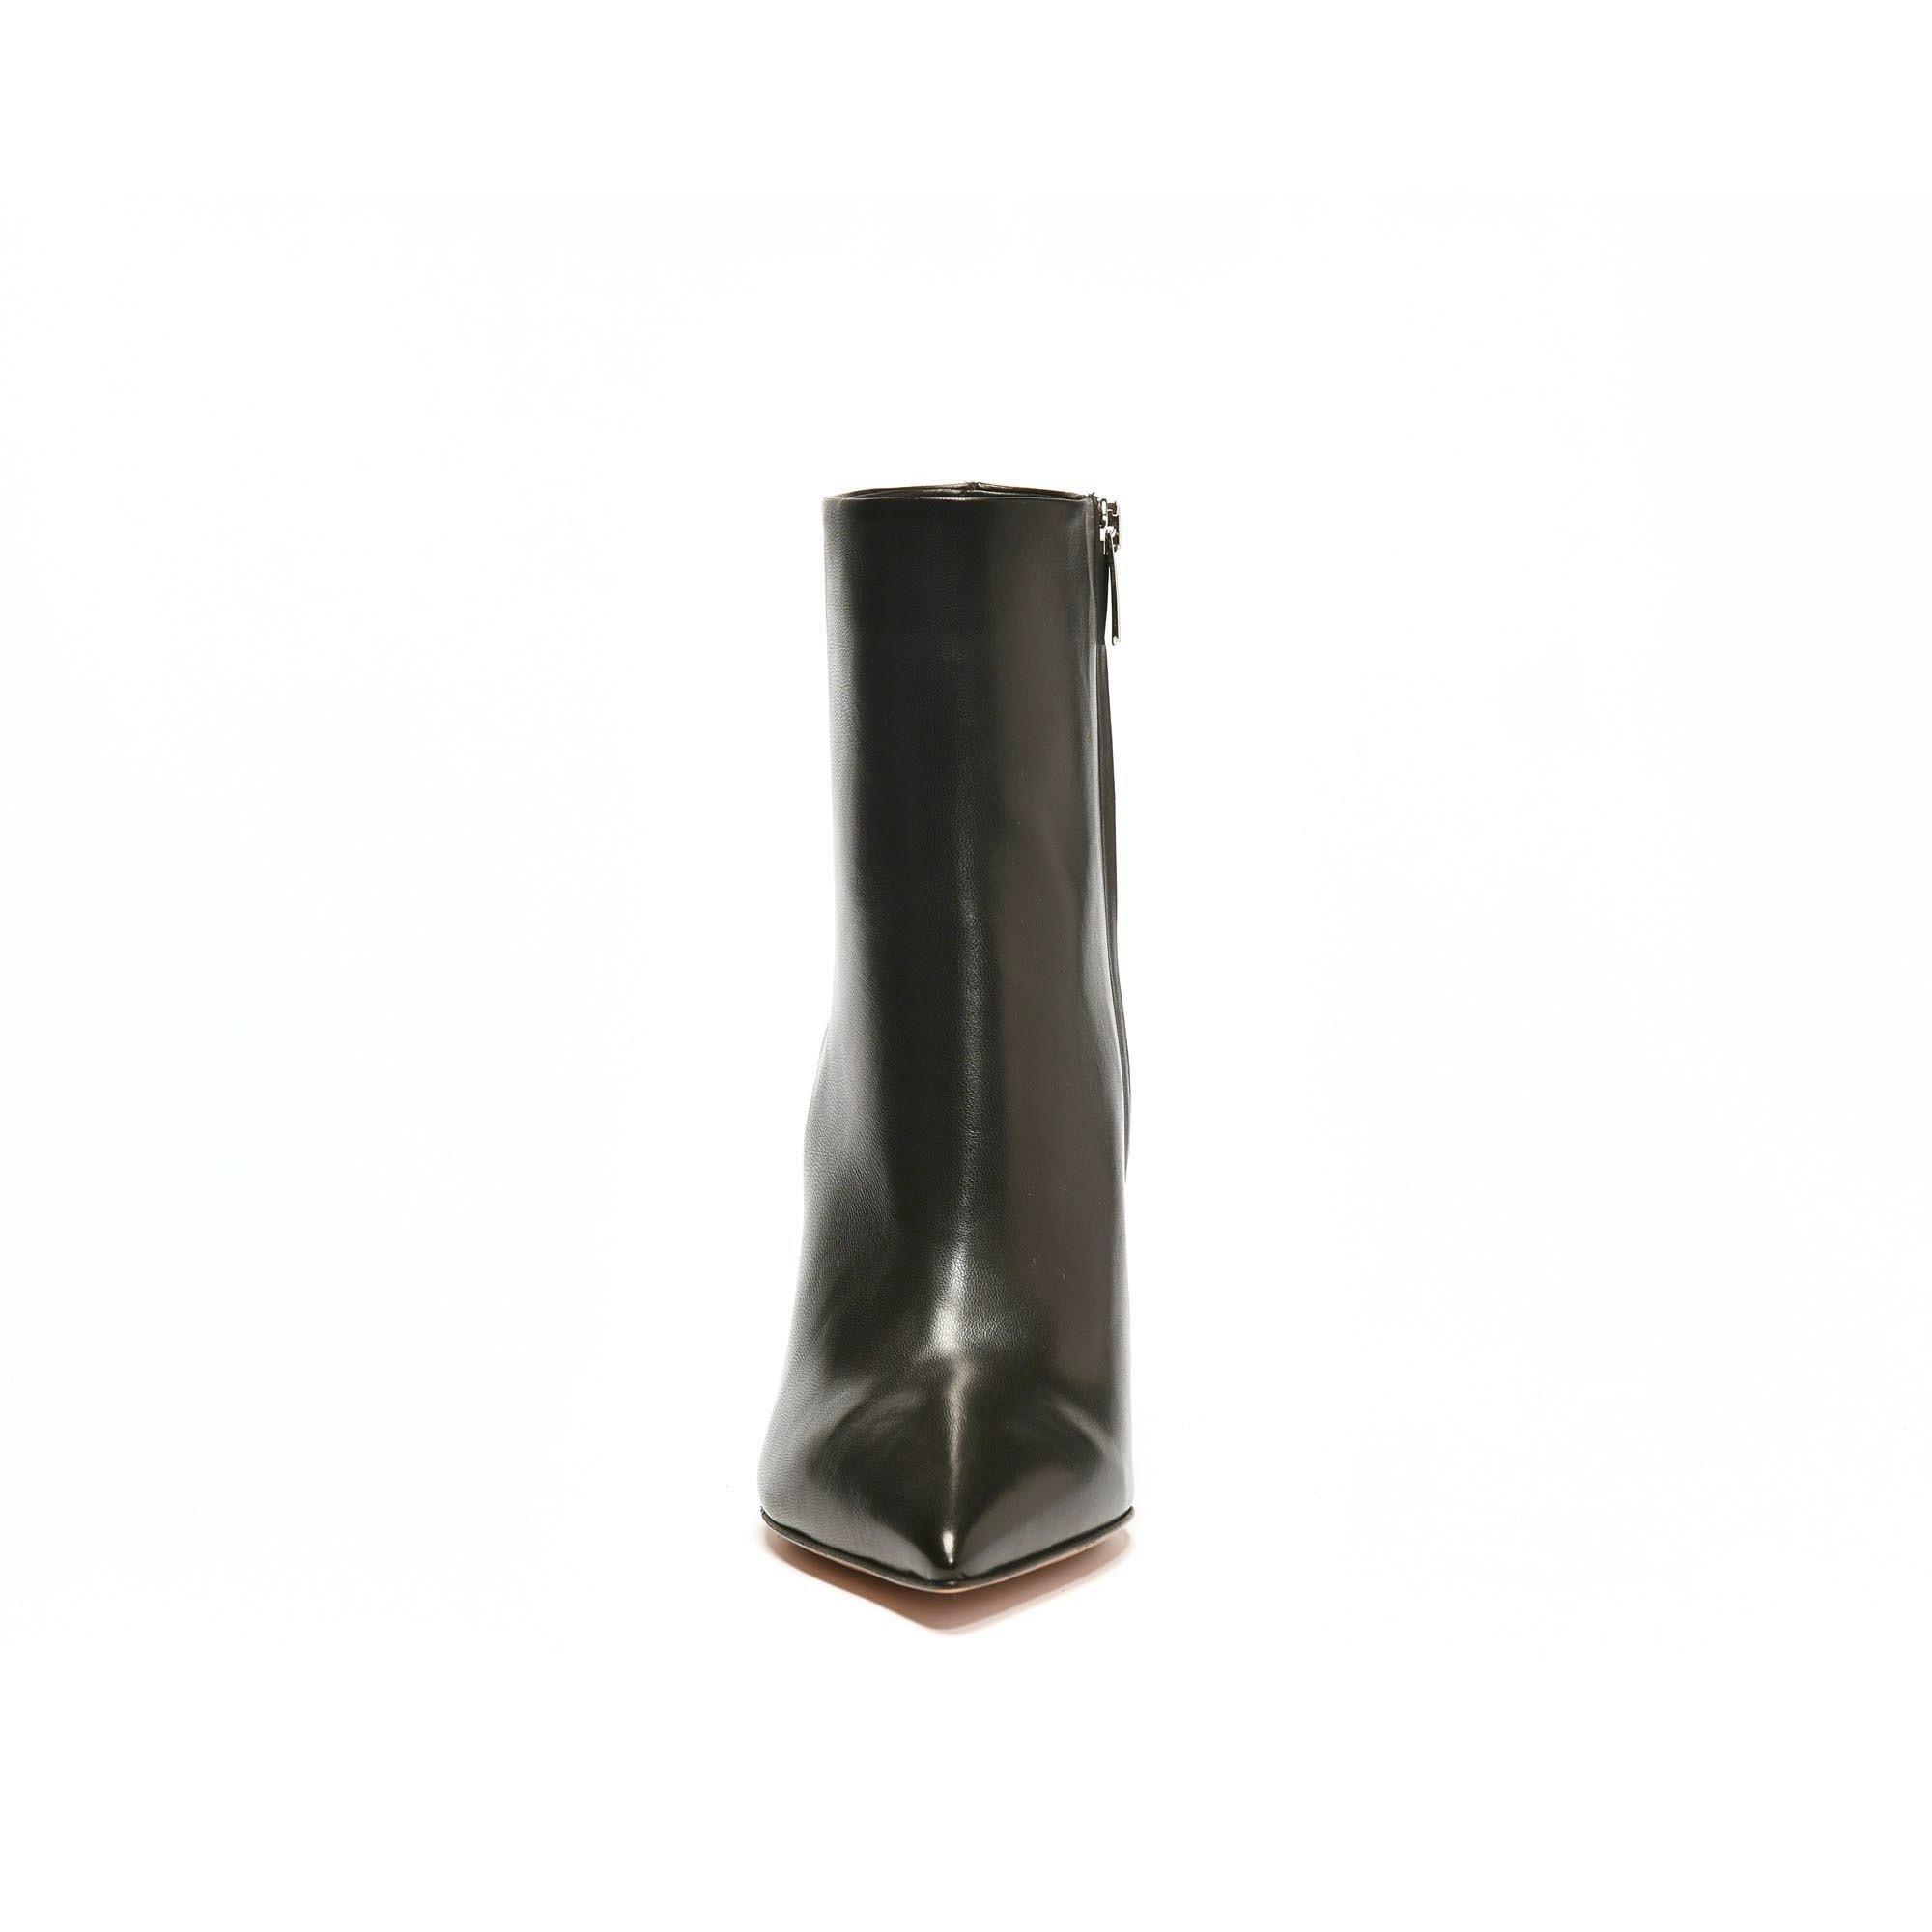 Piper Boots suède veau velour noir talon Gianvito Rossi